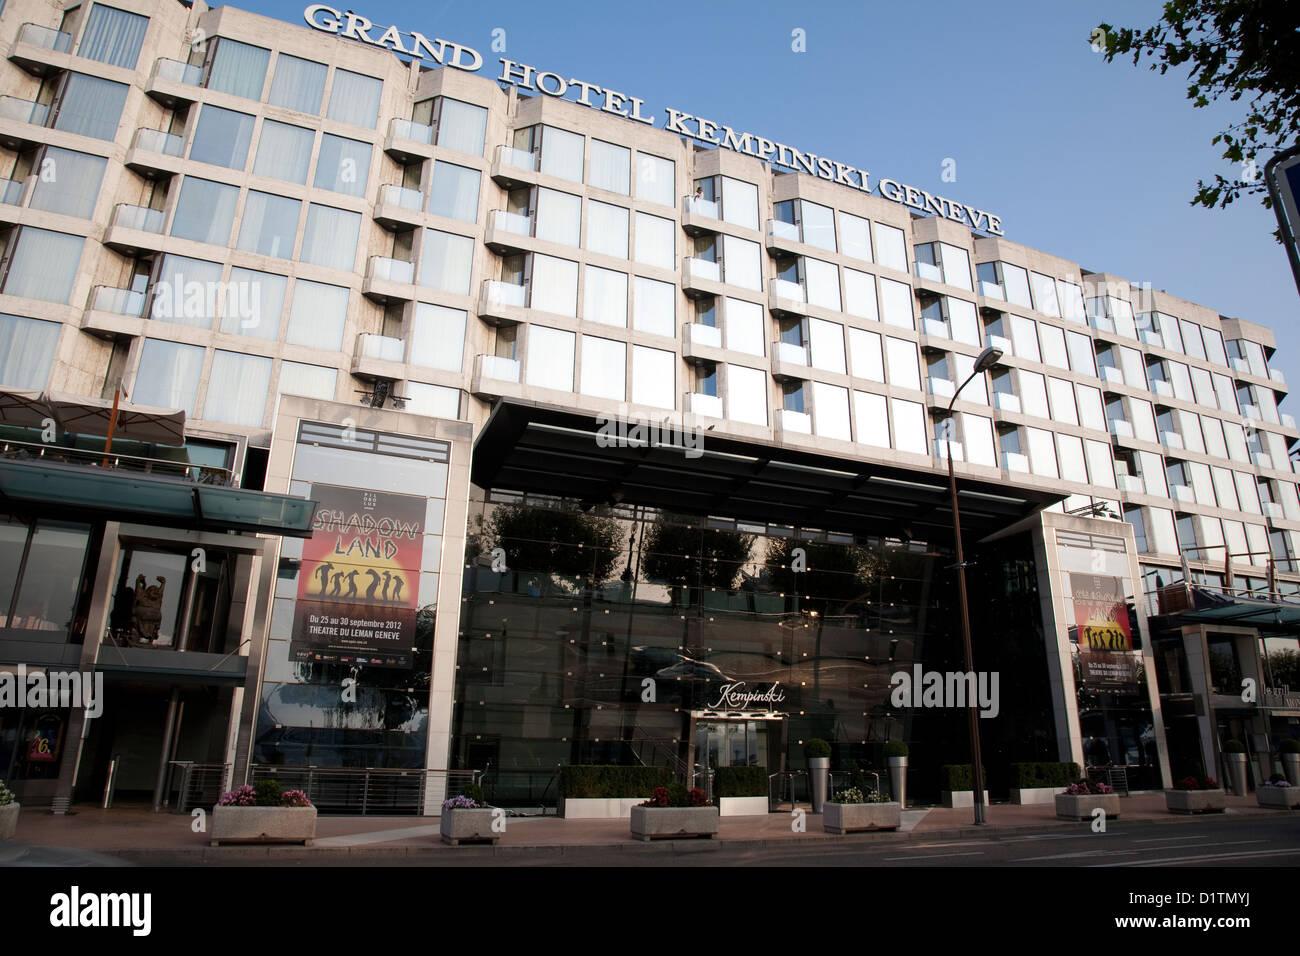 Grand Hotel Kempinski Geneve Geneva Switzerland Europe Stock Photo Royalty Free Image ...